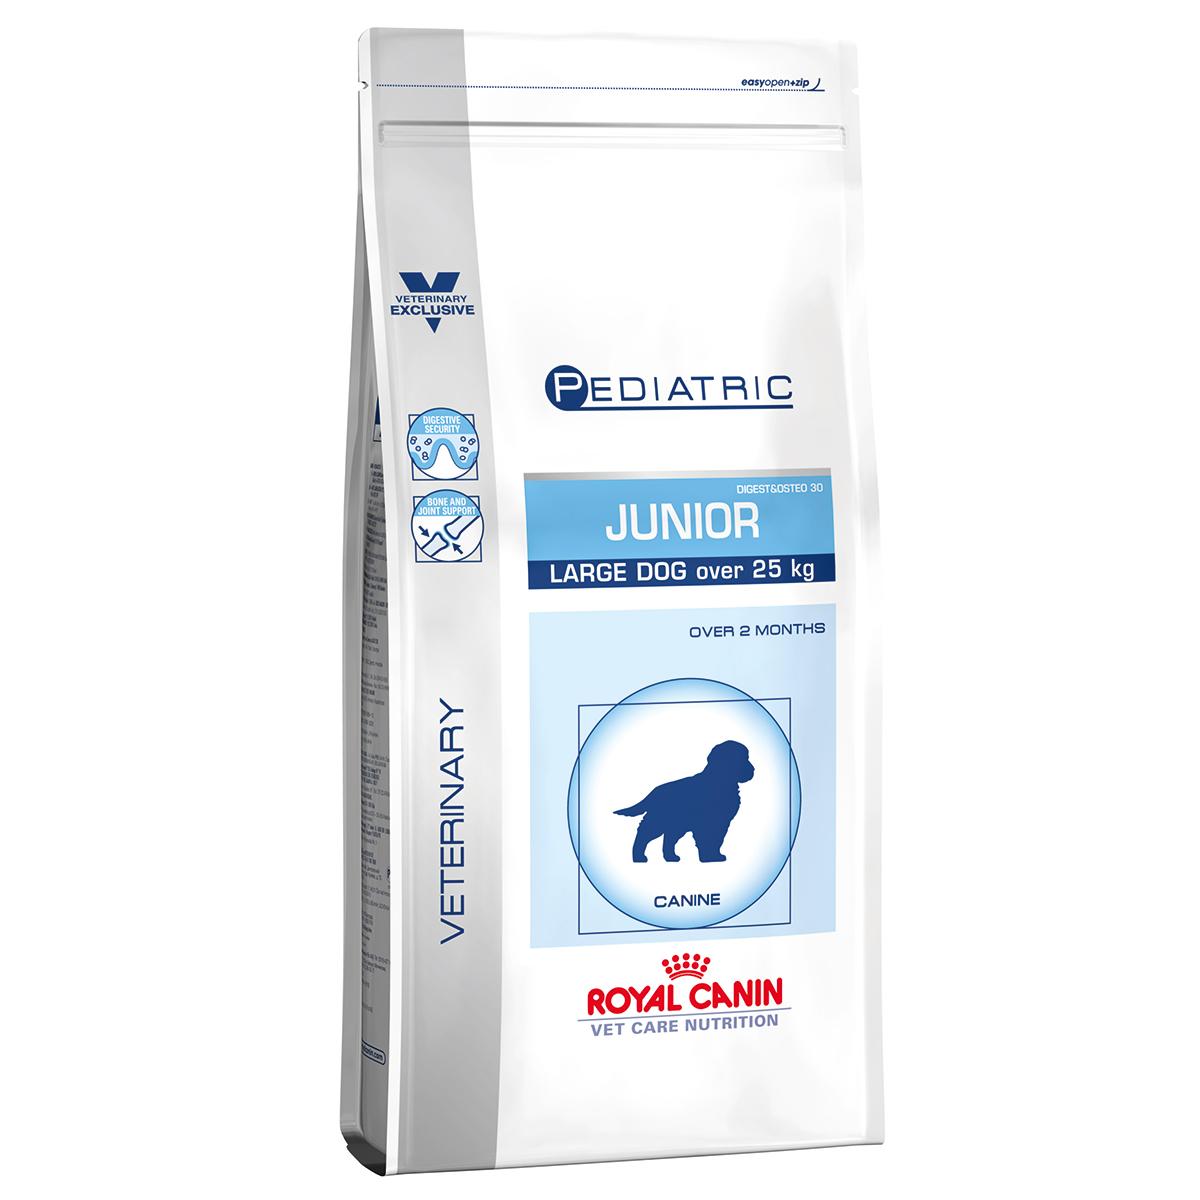 Royal Canin Pediatric Junior Large Dog 14 kg imagine